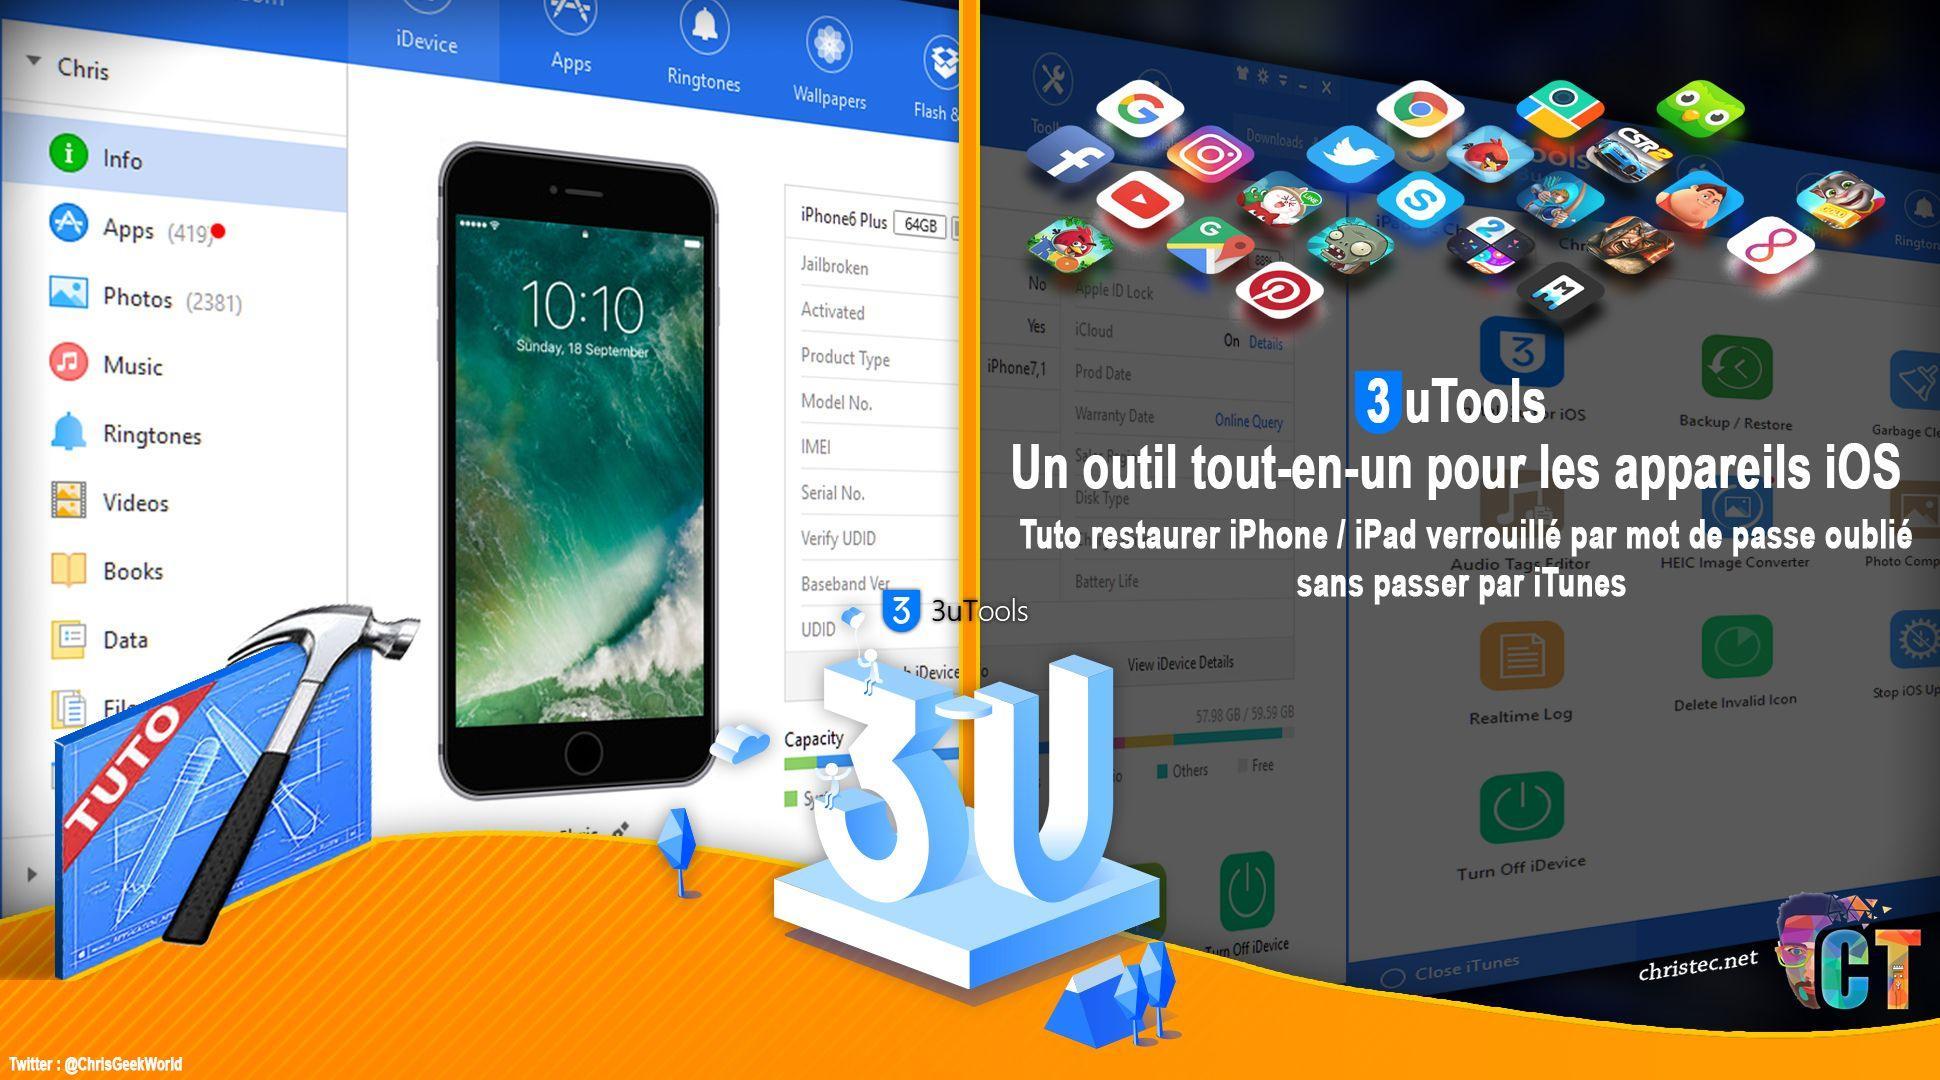 Utools App Ios